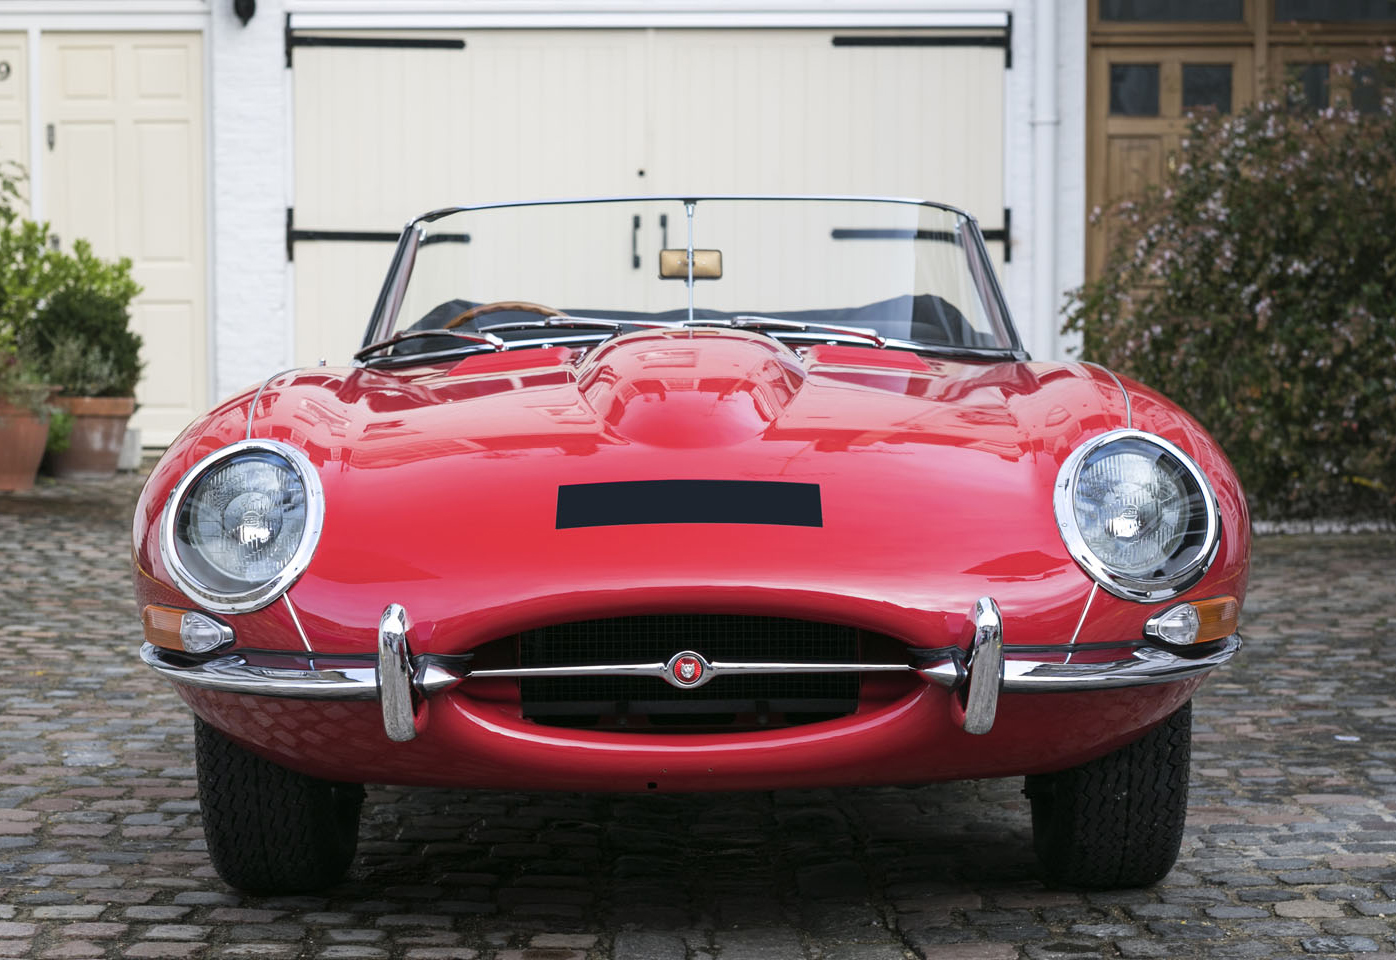 2. Jaguar E-Type-Roadster-front.jpg